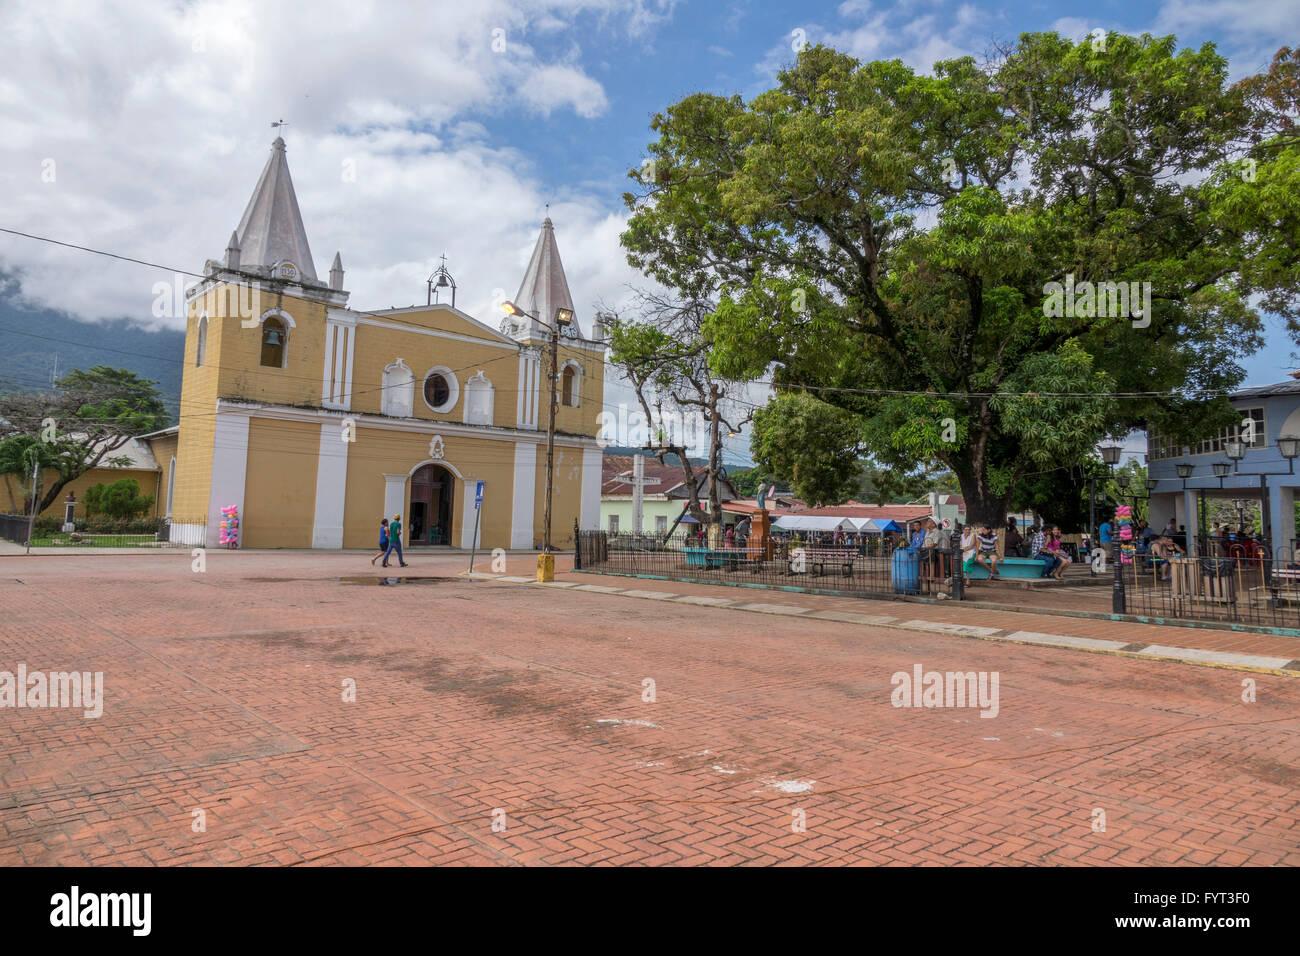 The Cathedral San Juan Bautista In The Centre Of Trujillo, Honduras Stock Photo